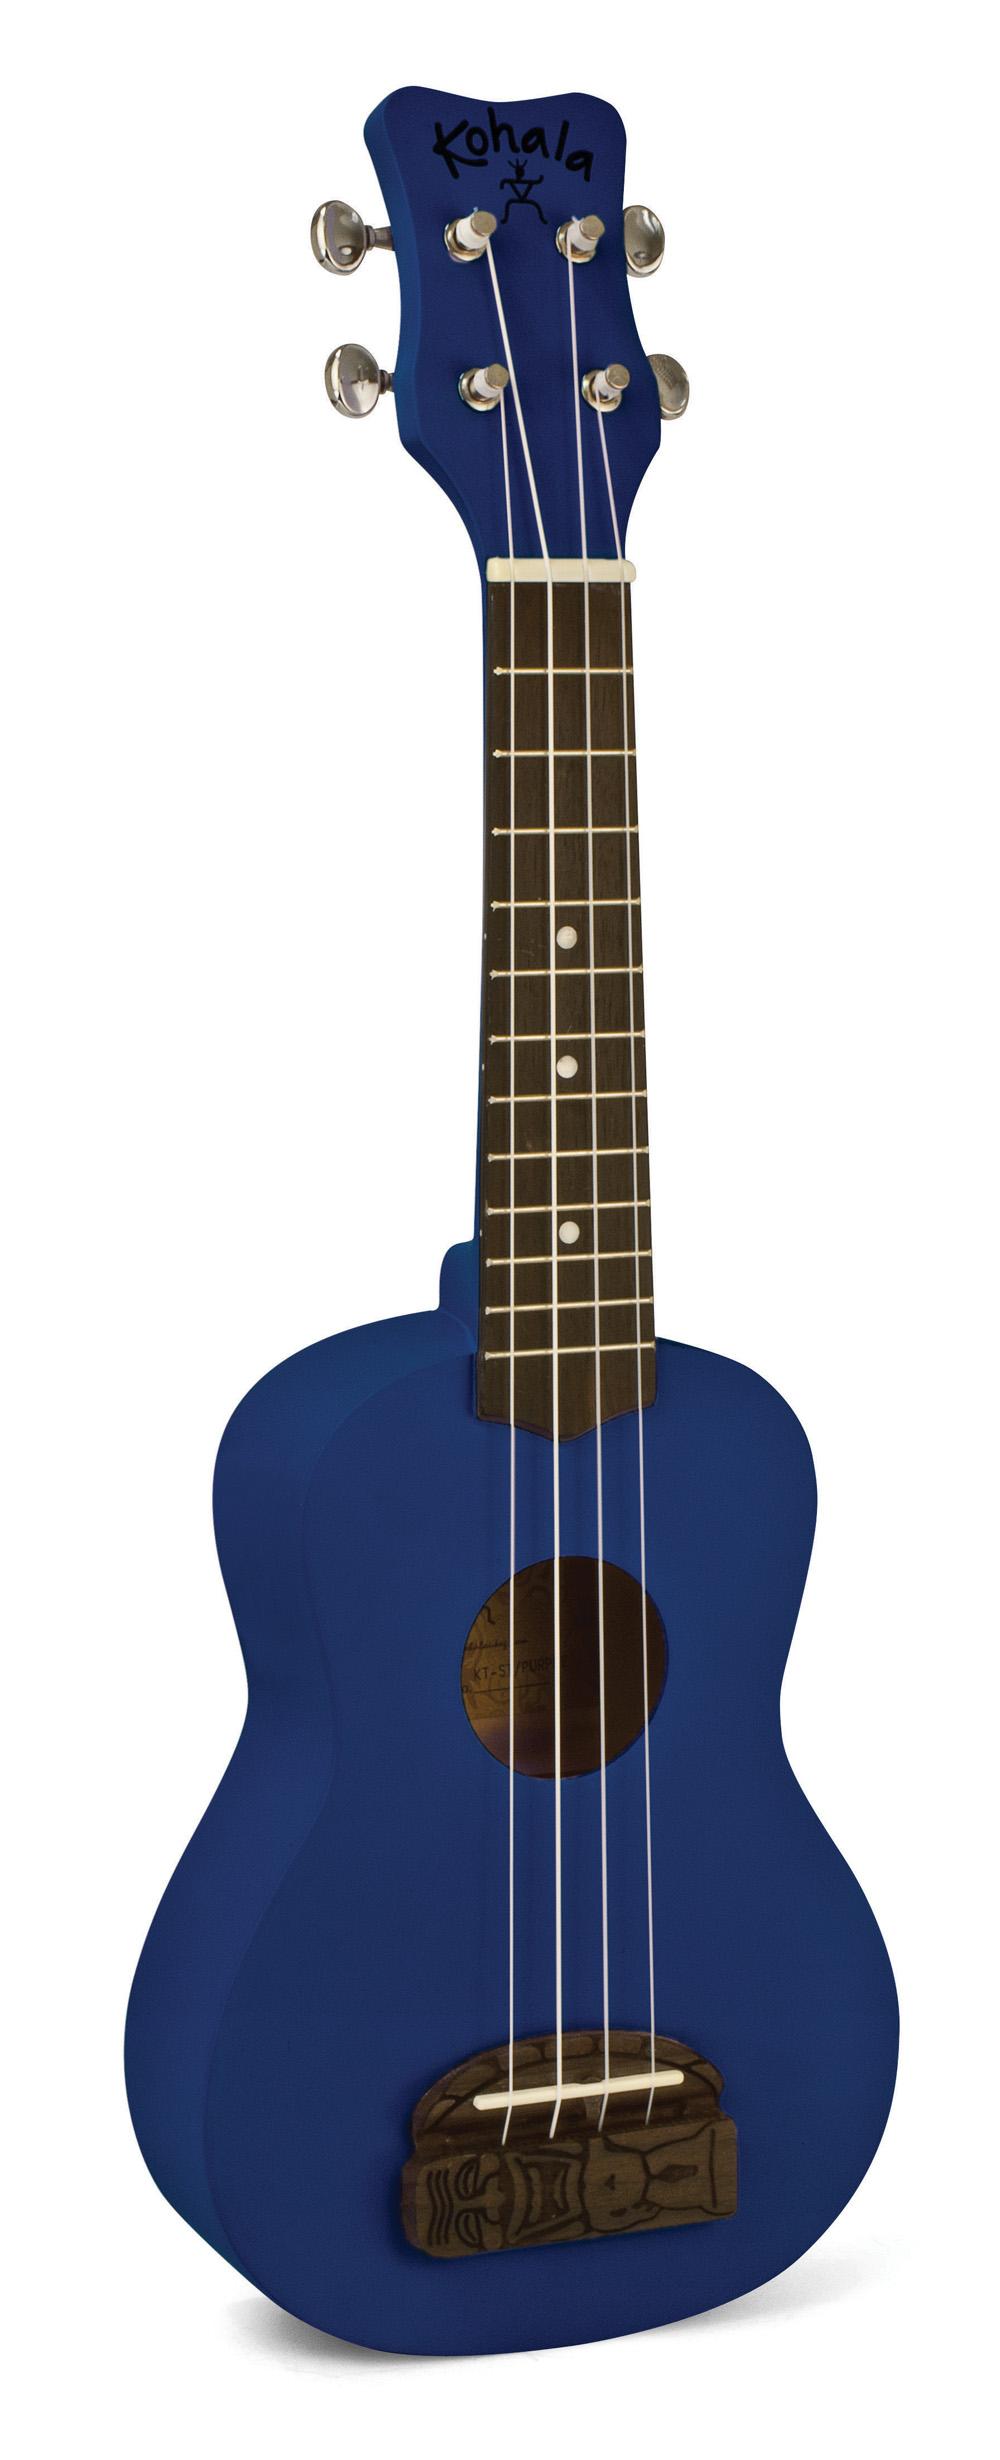 Kohala KT-SBL Tiki Uke Ocean Blue Soprano Ukulele